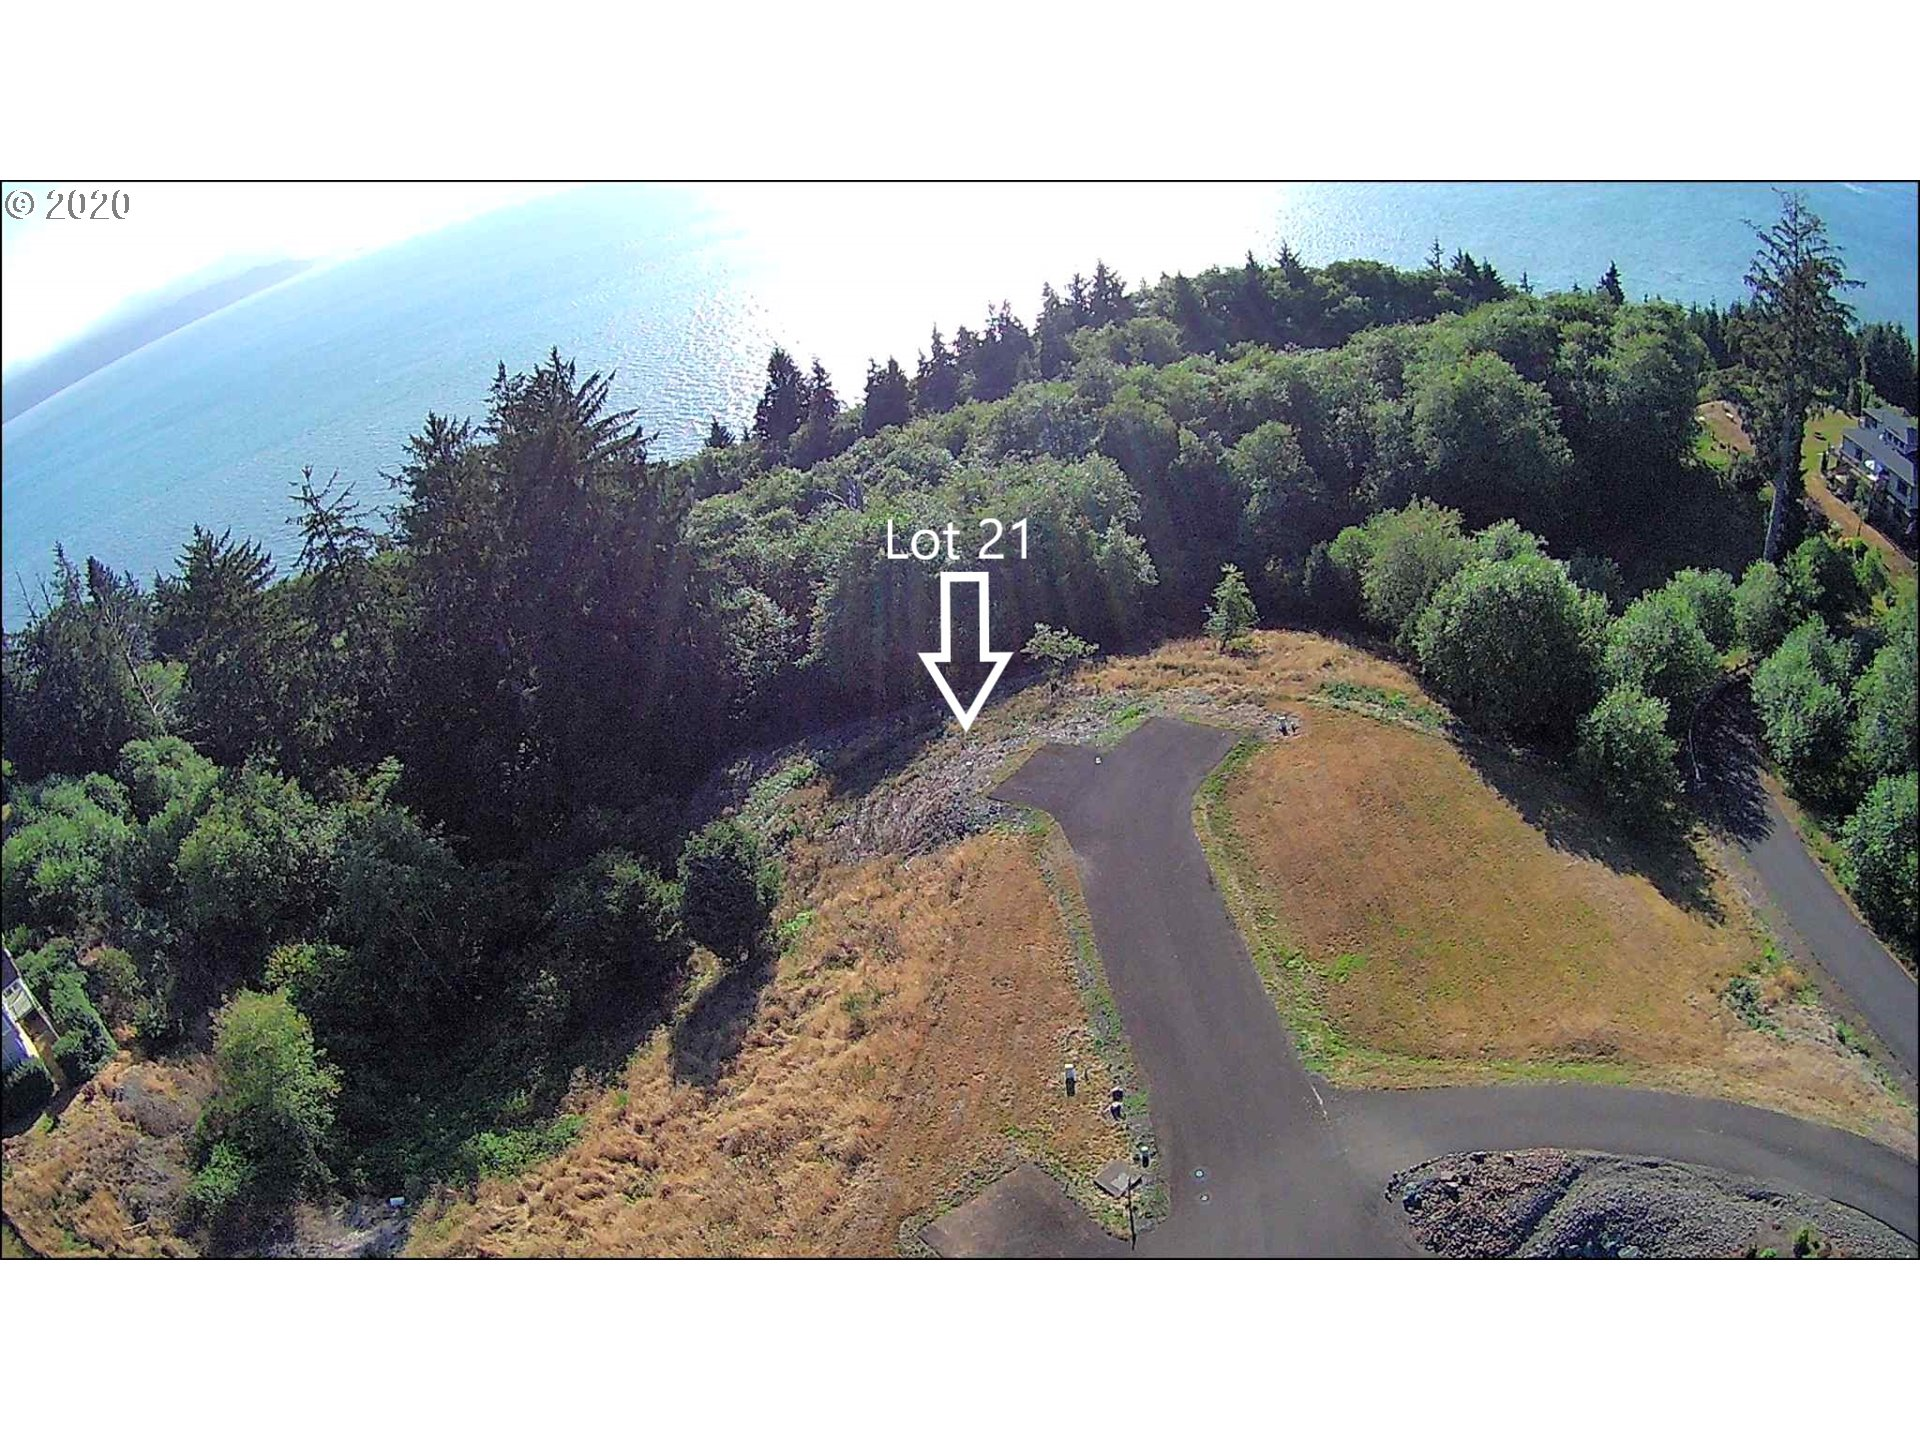 North Ridge Lot21, Bay City, Oregon 97107, ,Lots And Land,For Sale,North Ridge Lot21,20036655